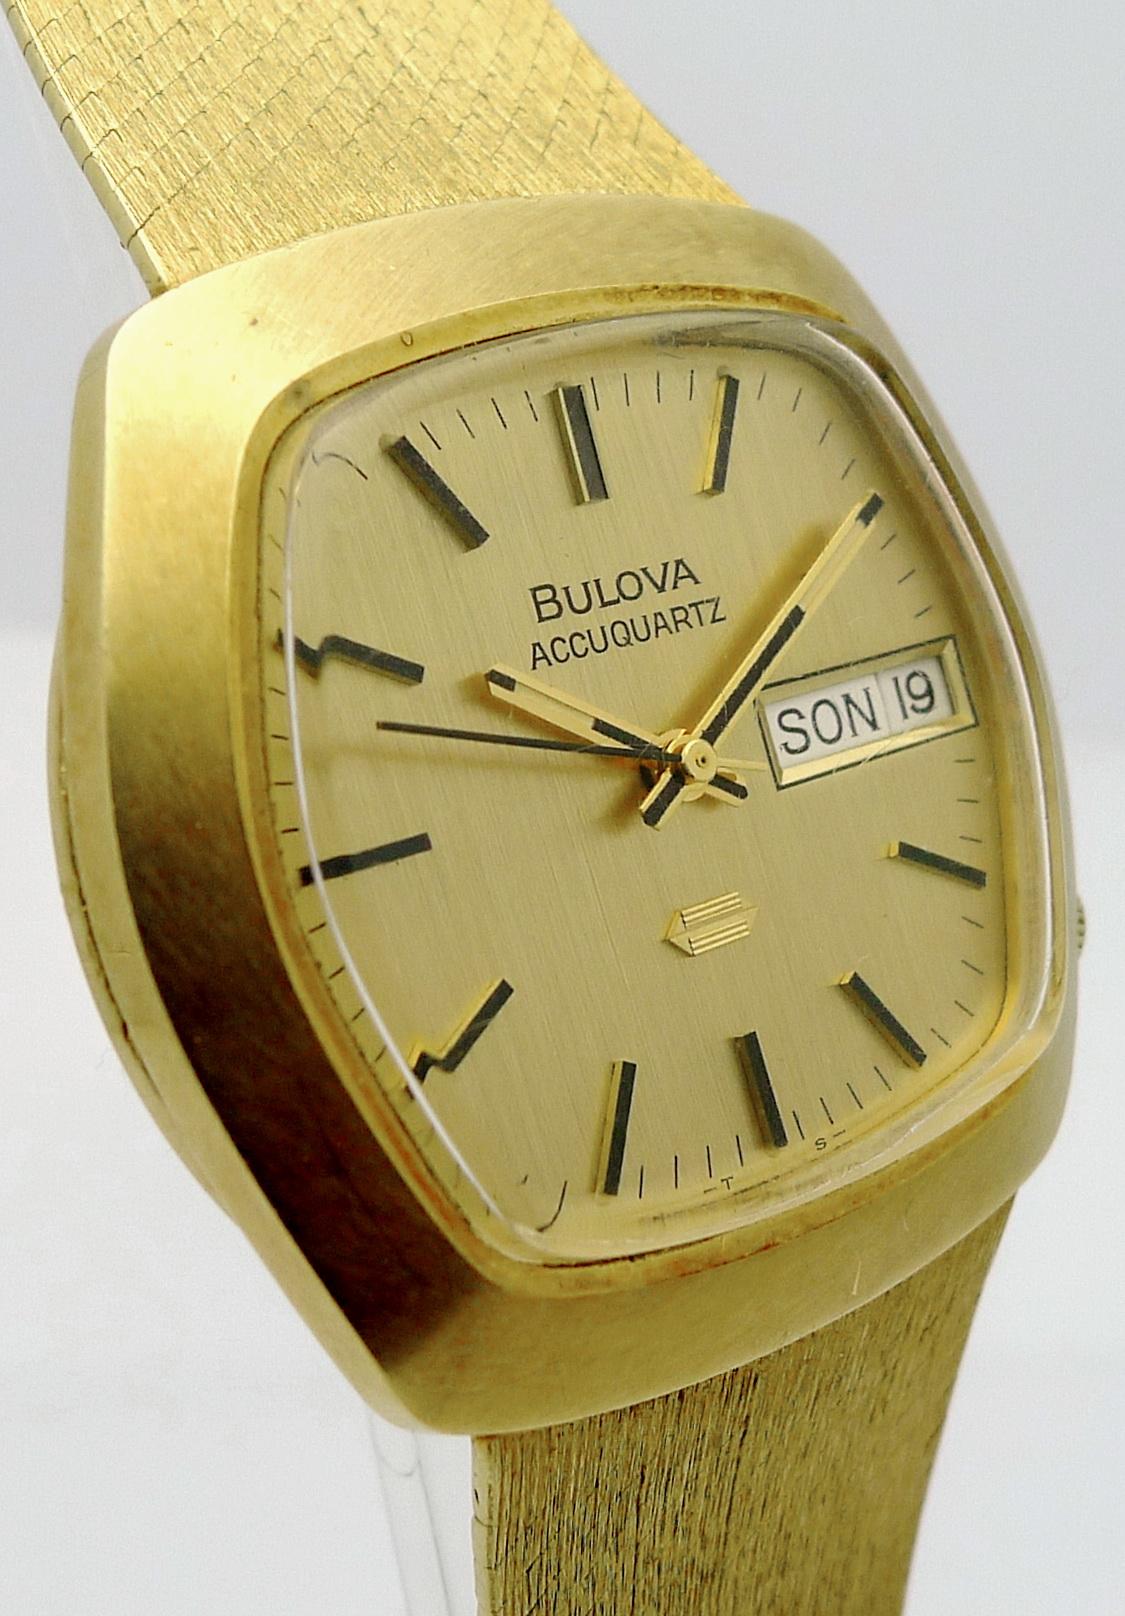 bulova accuquartz 18ct gold herren stimmgabel armbanduhr. Black Bedroom Furniture Sets. Home Design Ideas